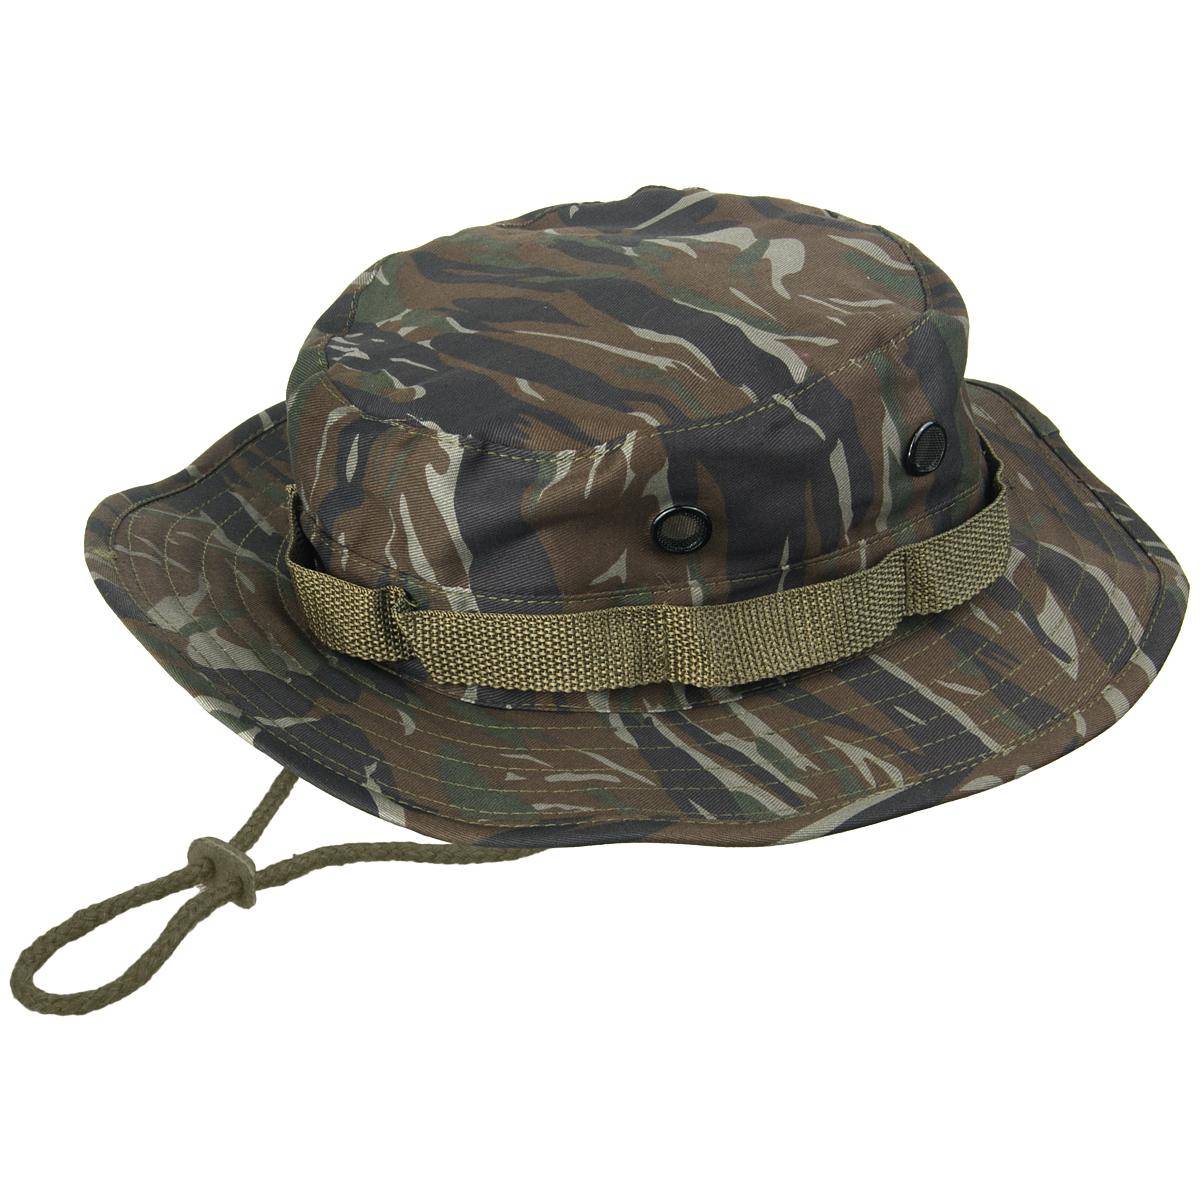 3d5bccb50ff Details about Military Vietnam Army Combat GI Boonie Jungle Bush Hat Tiger  Stripe Camo S-XXL